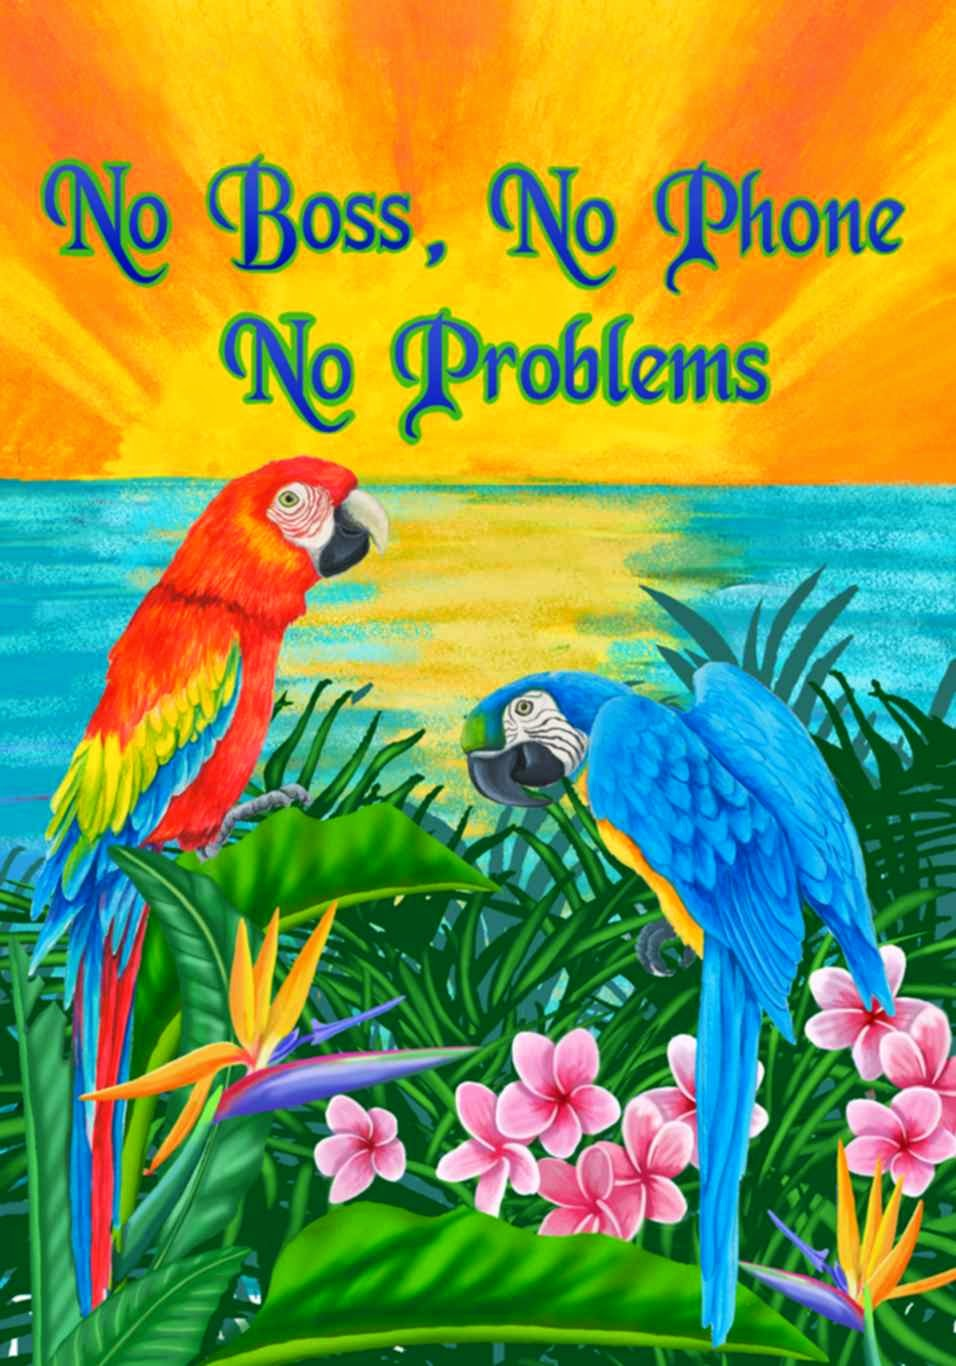 no boss, no phone, no problems summer garden flag